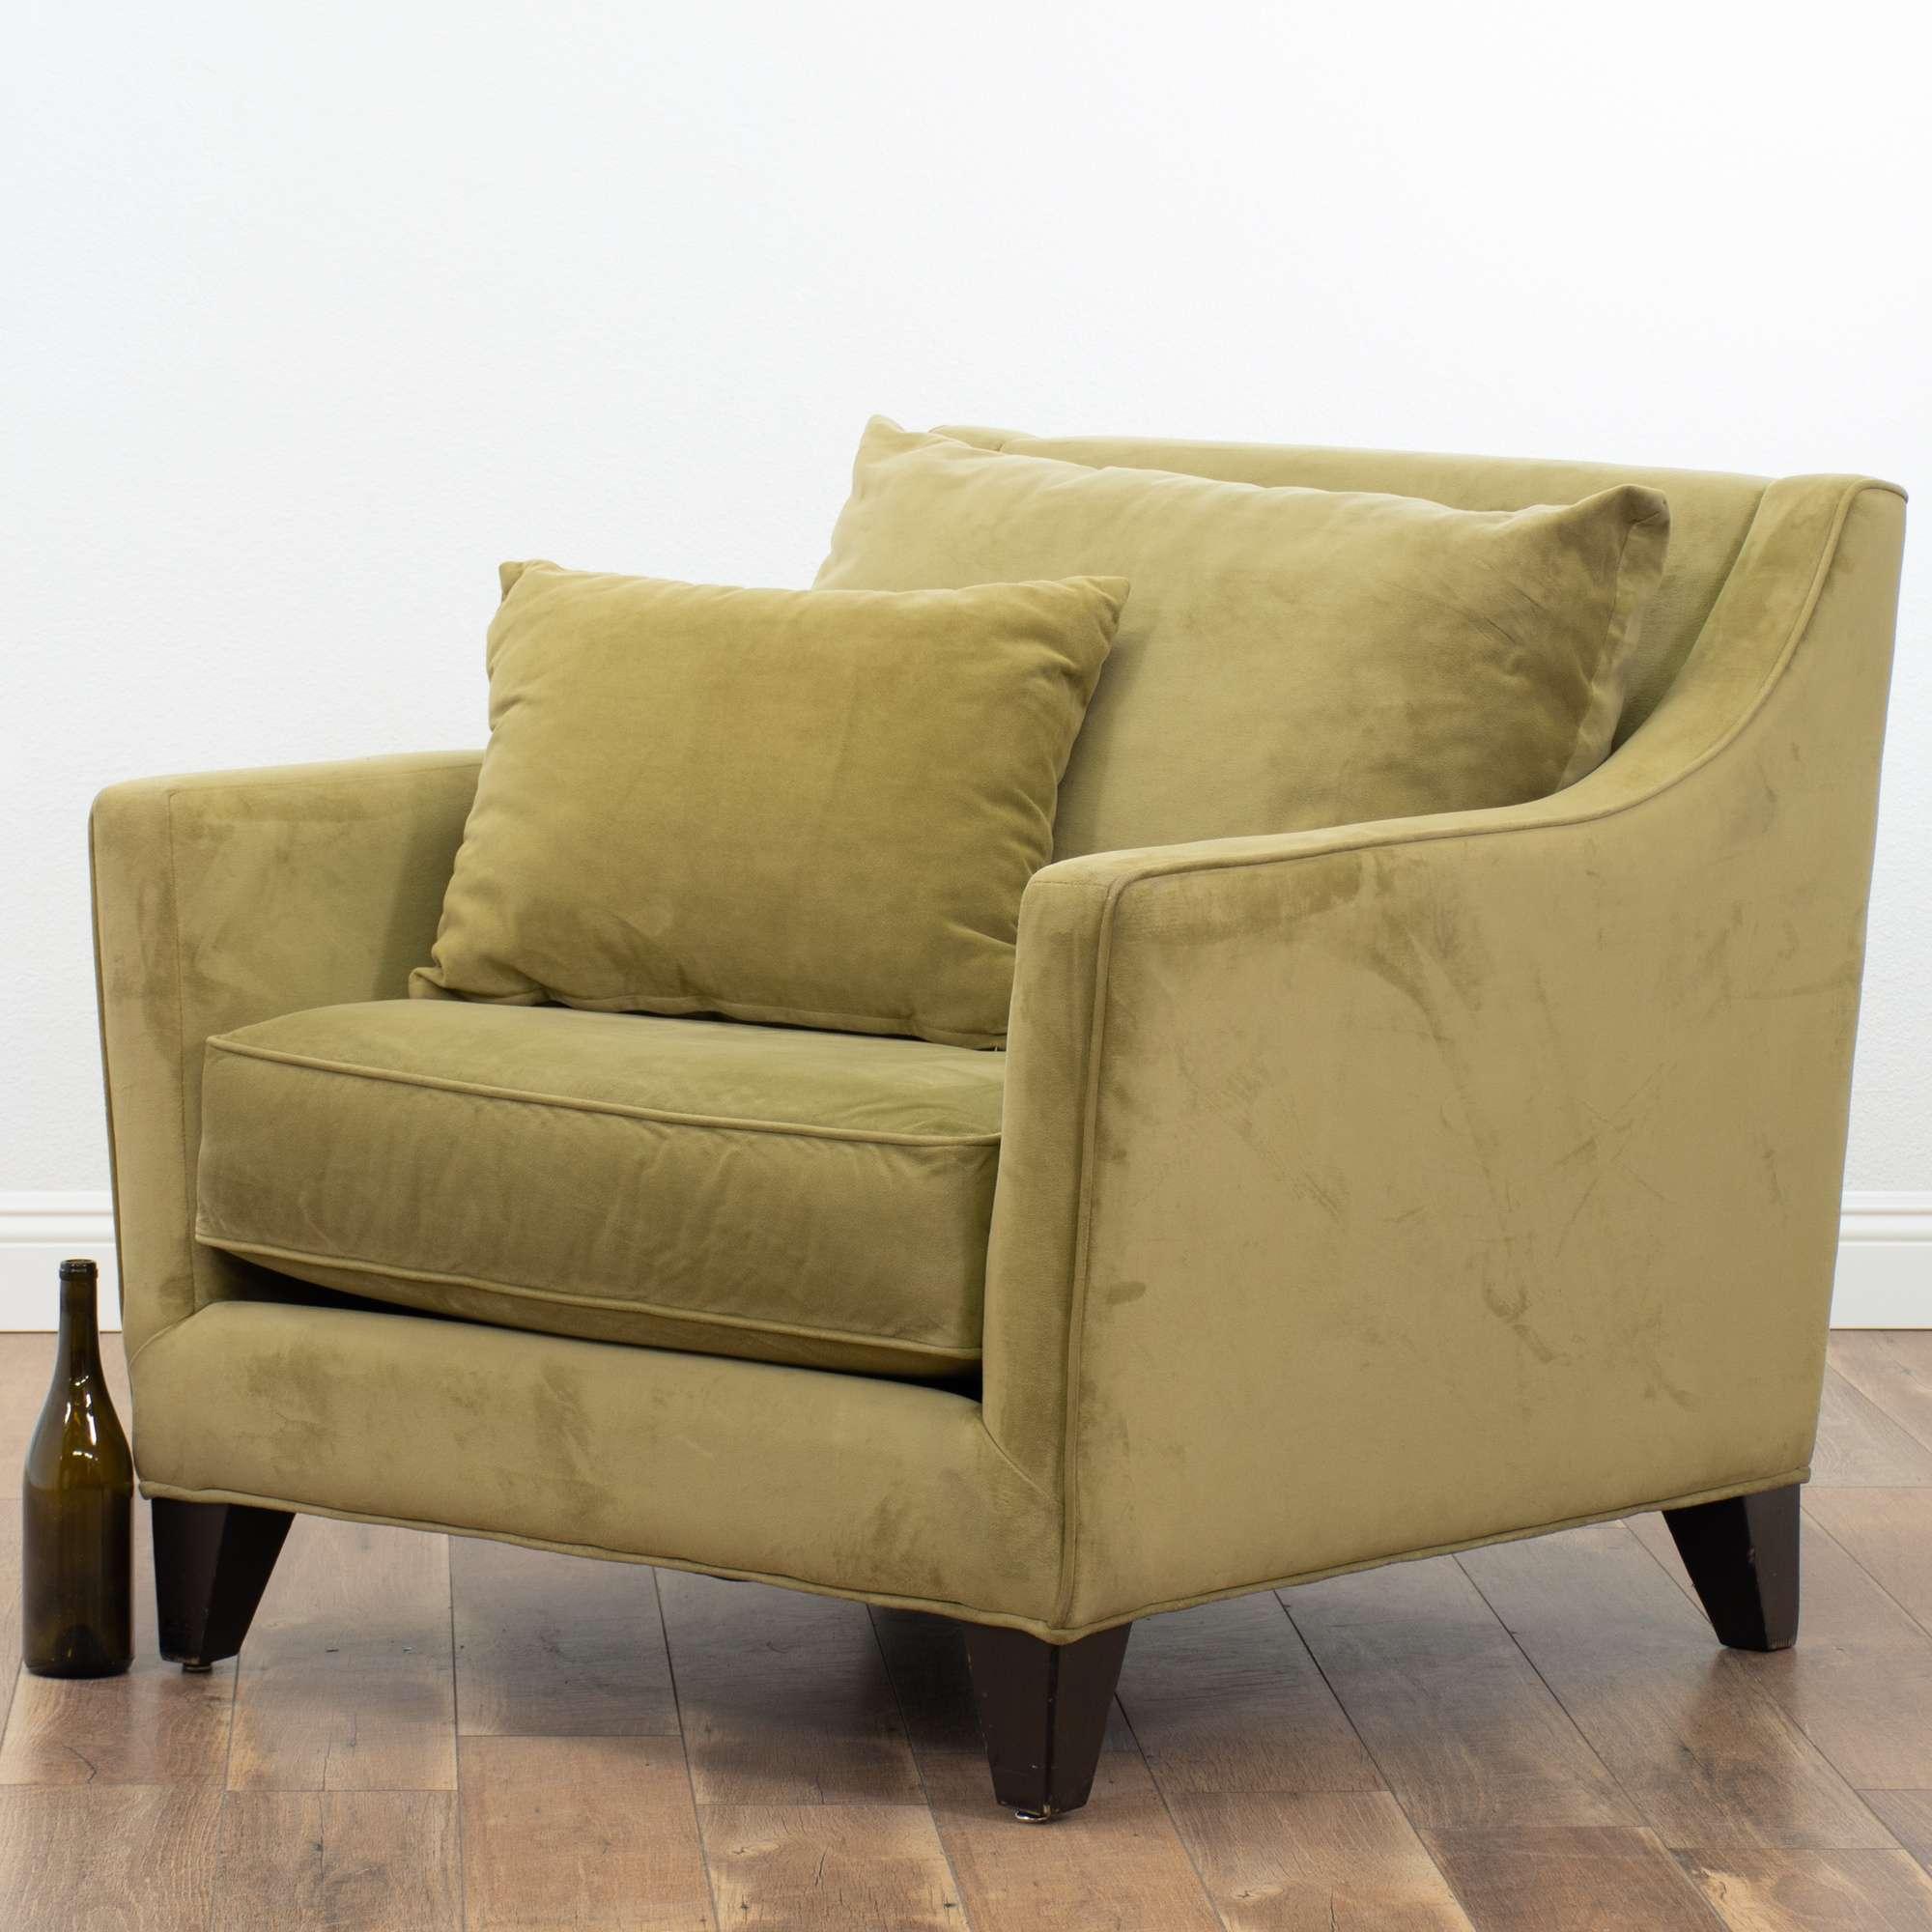 Tarragon Microfiber Armchair W/ Throw Pillow | Loveseat ...